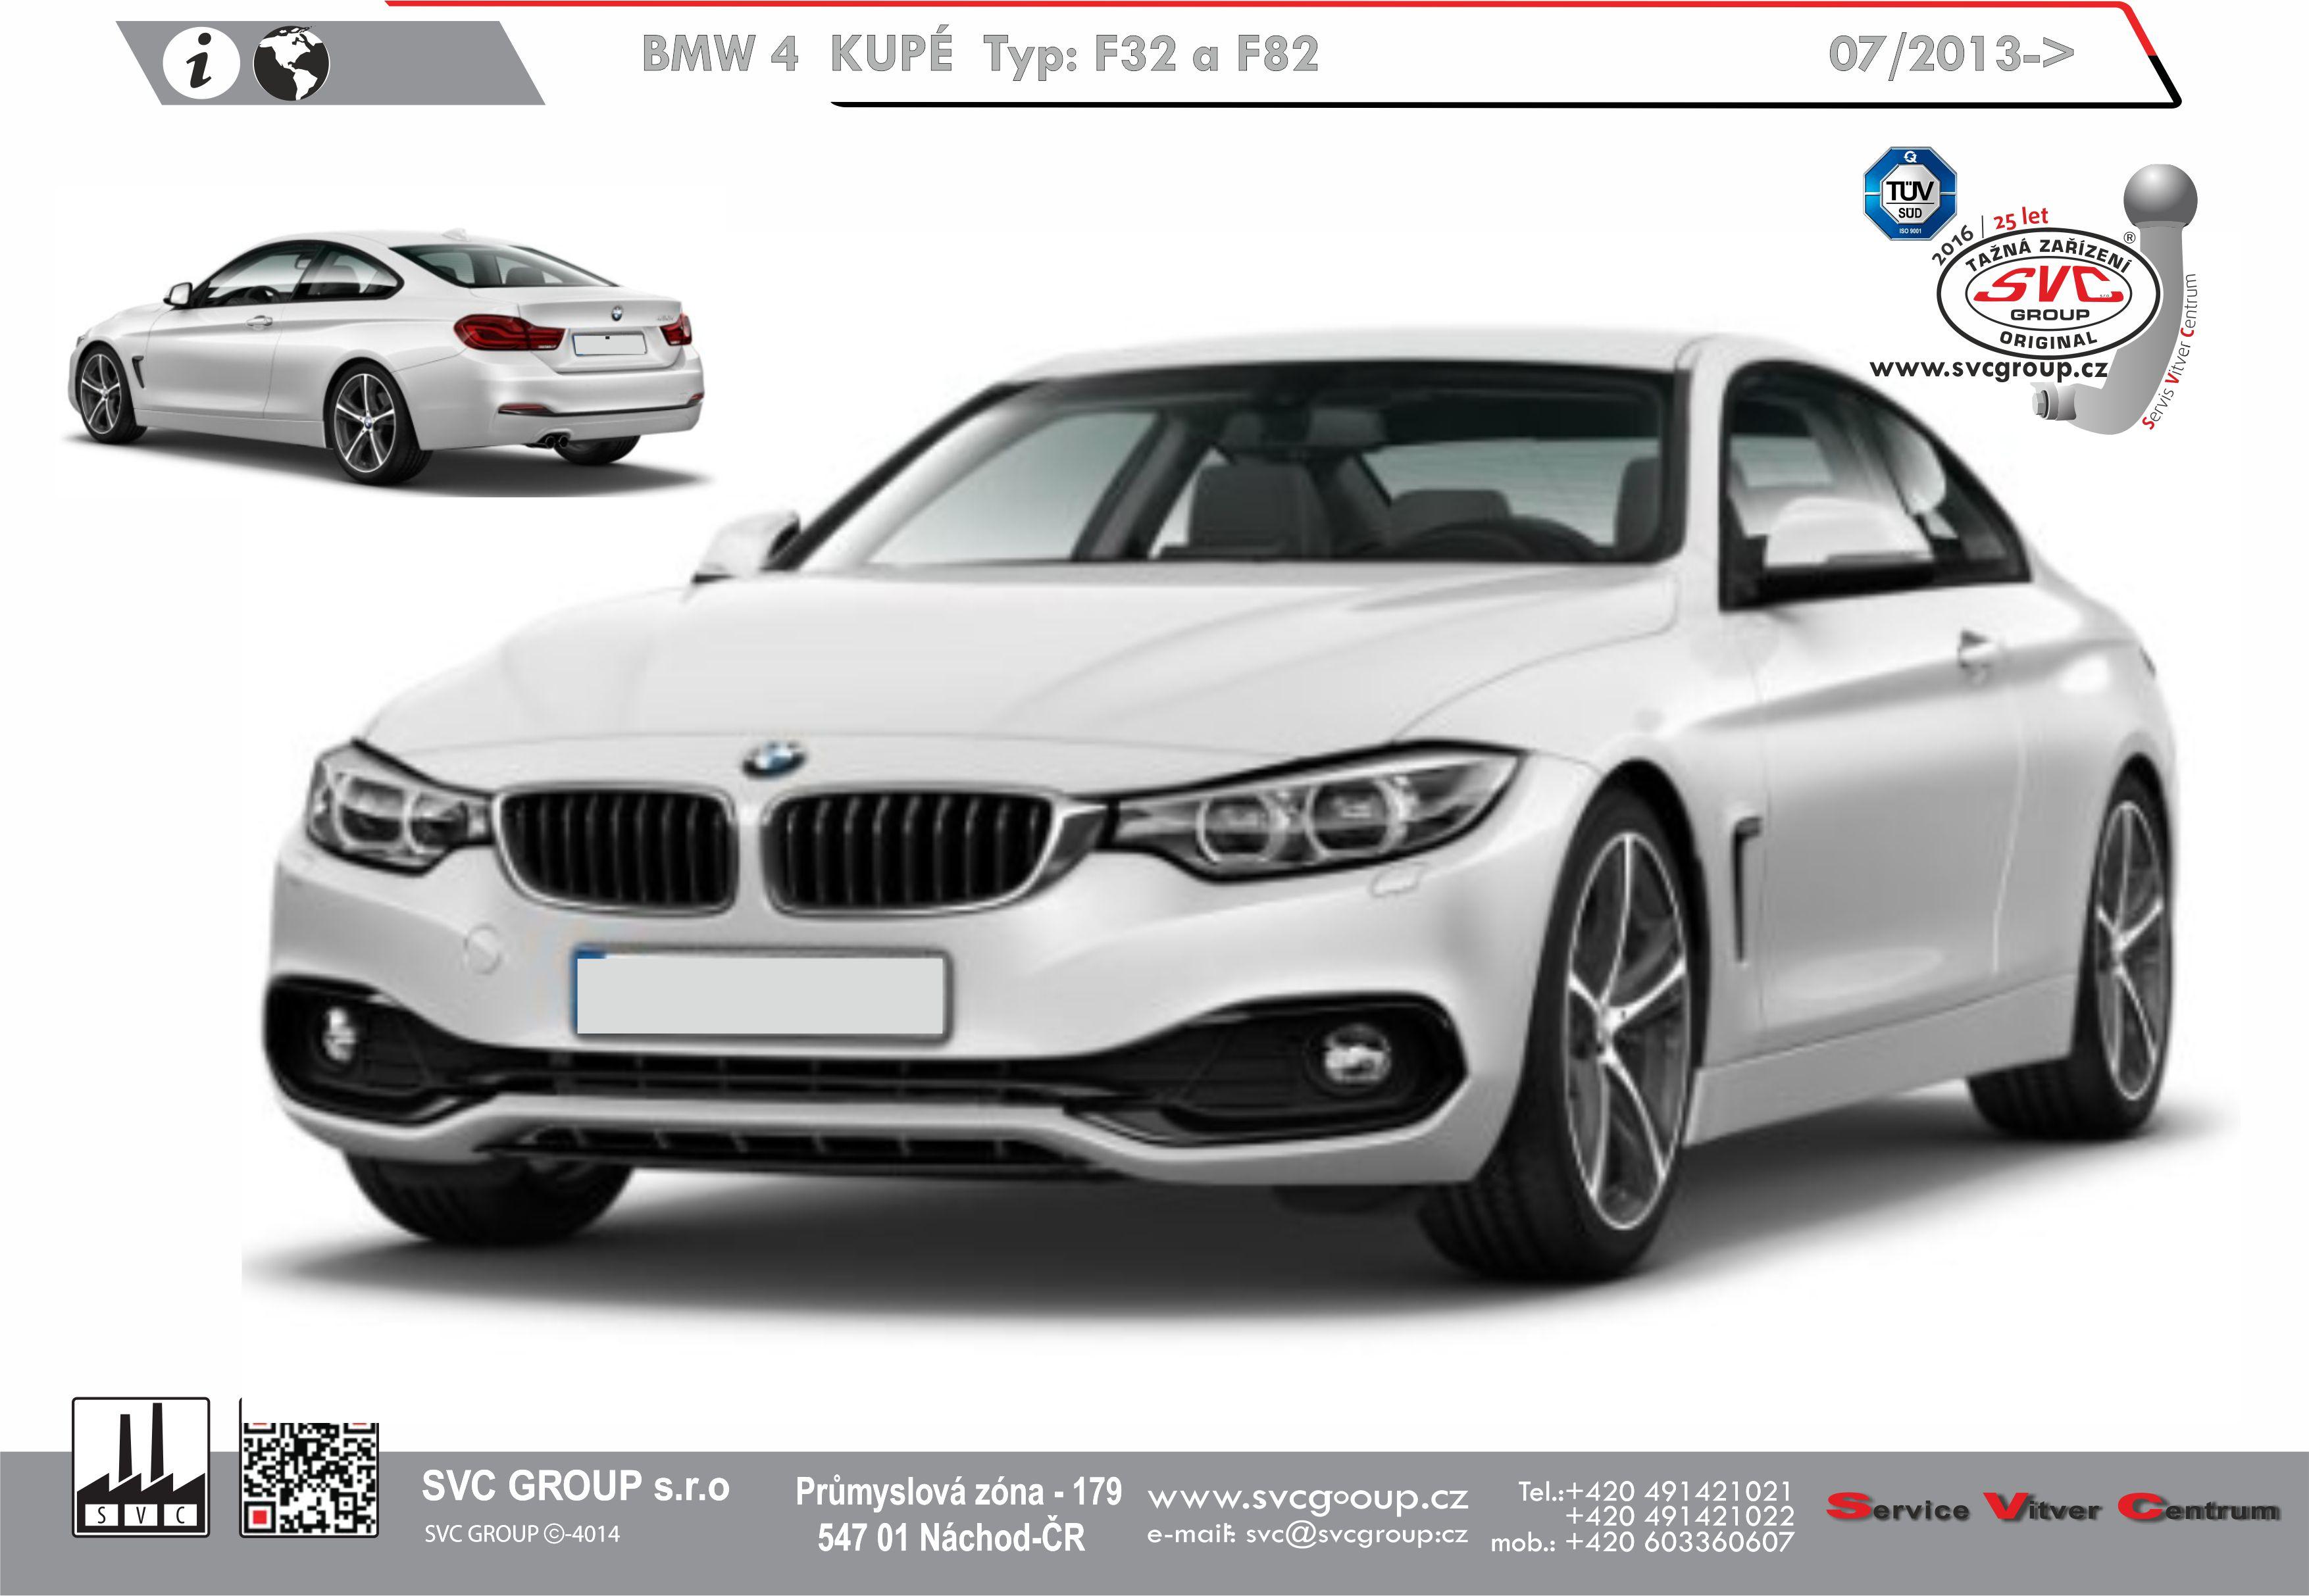 BMW 4 Série Kupé